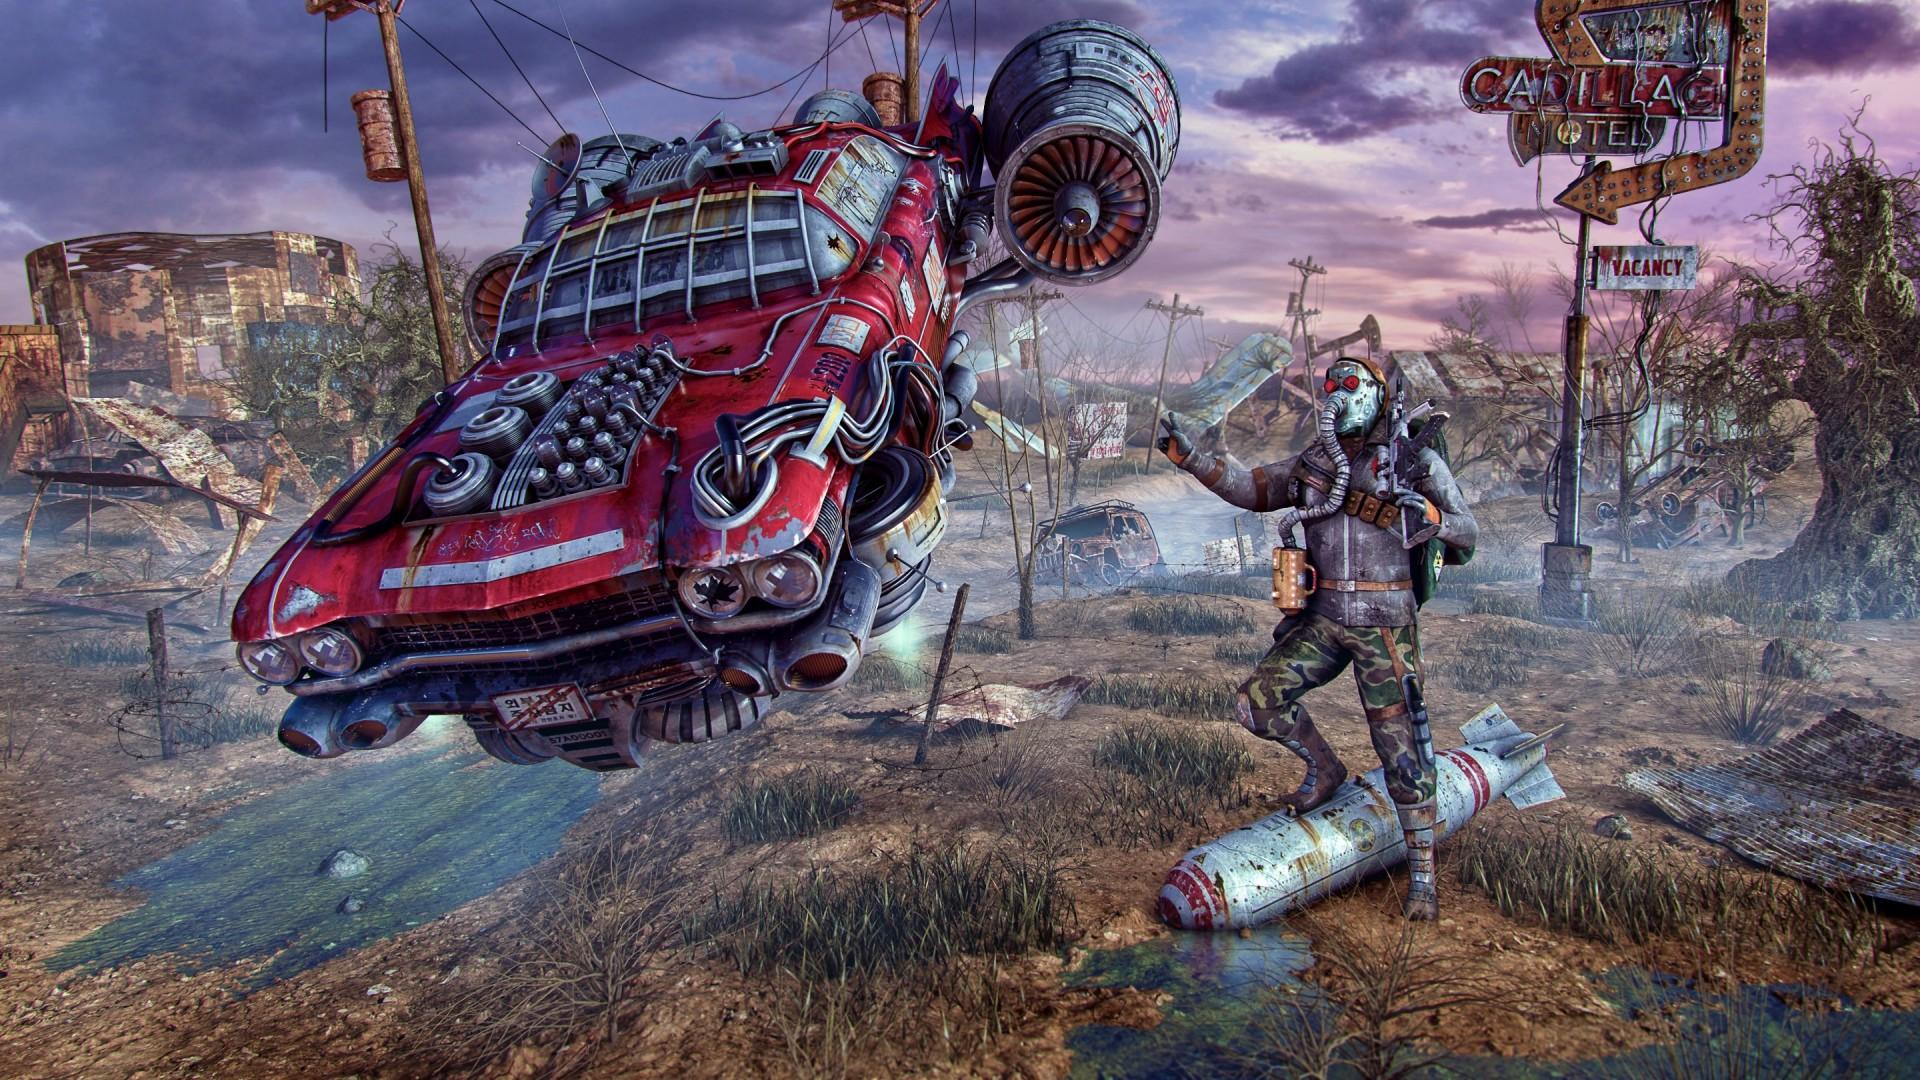 Wallpaper fallout, wasteland, cars, flight, art